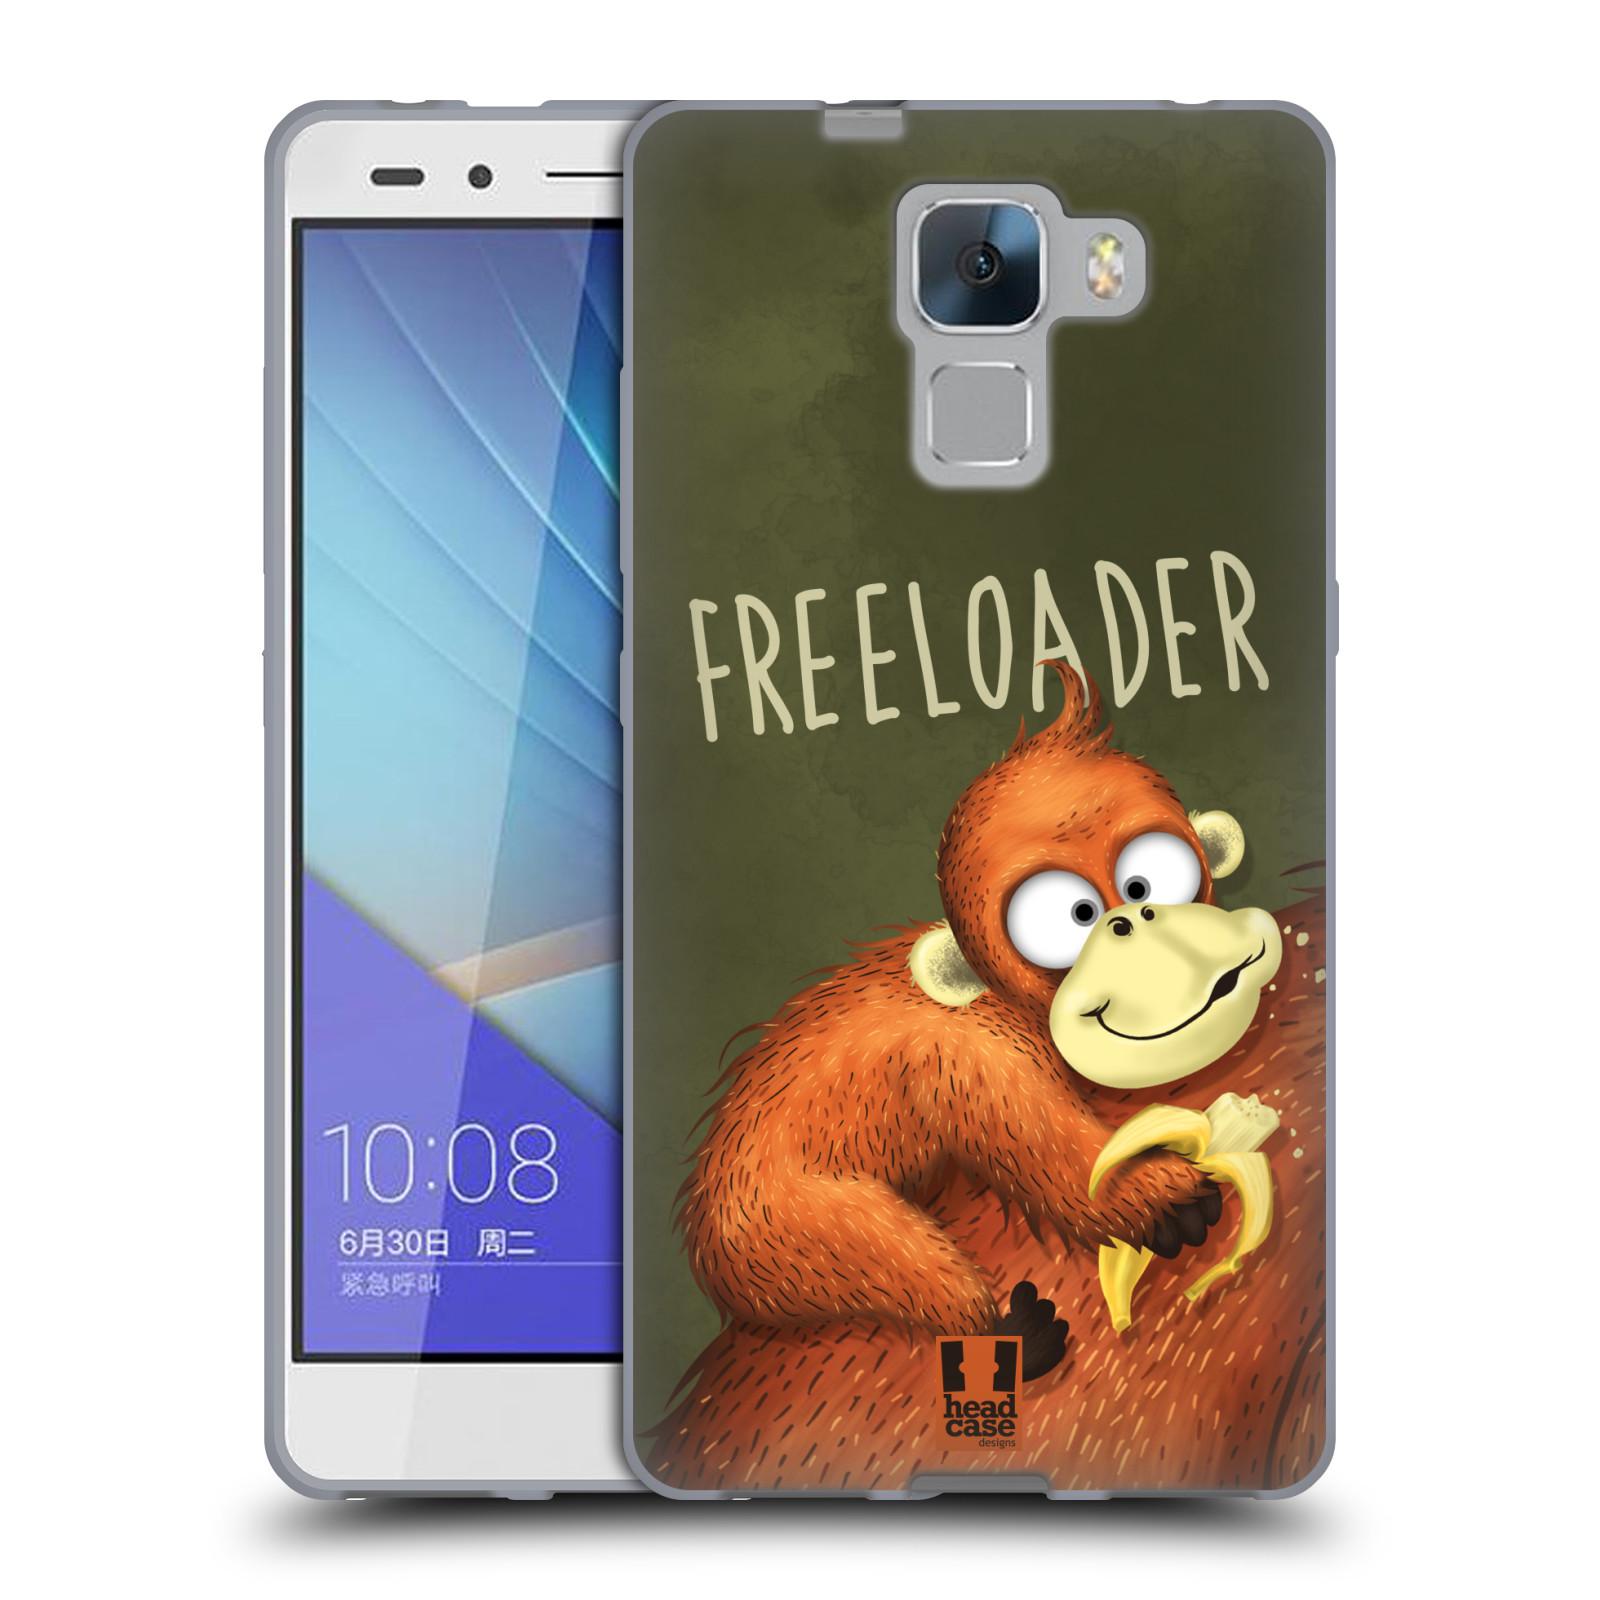 Silikonové pouzdro na mobil Honor 7 HEAD CASE Opičák Freeloader